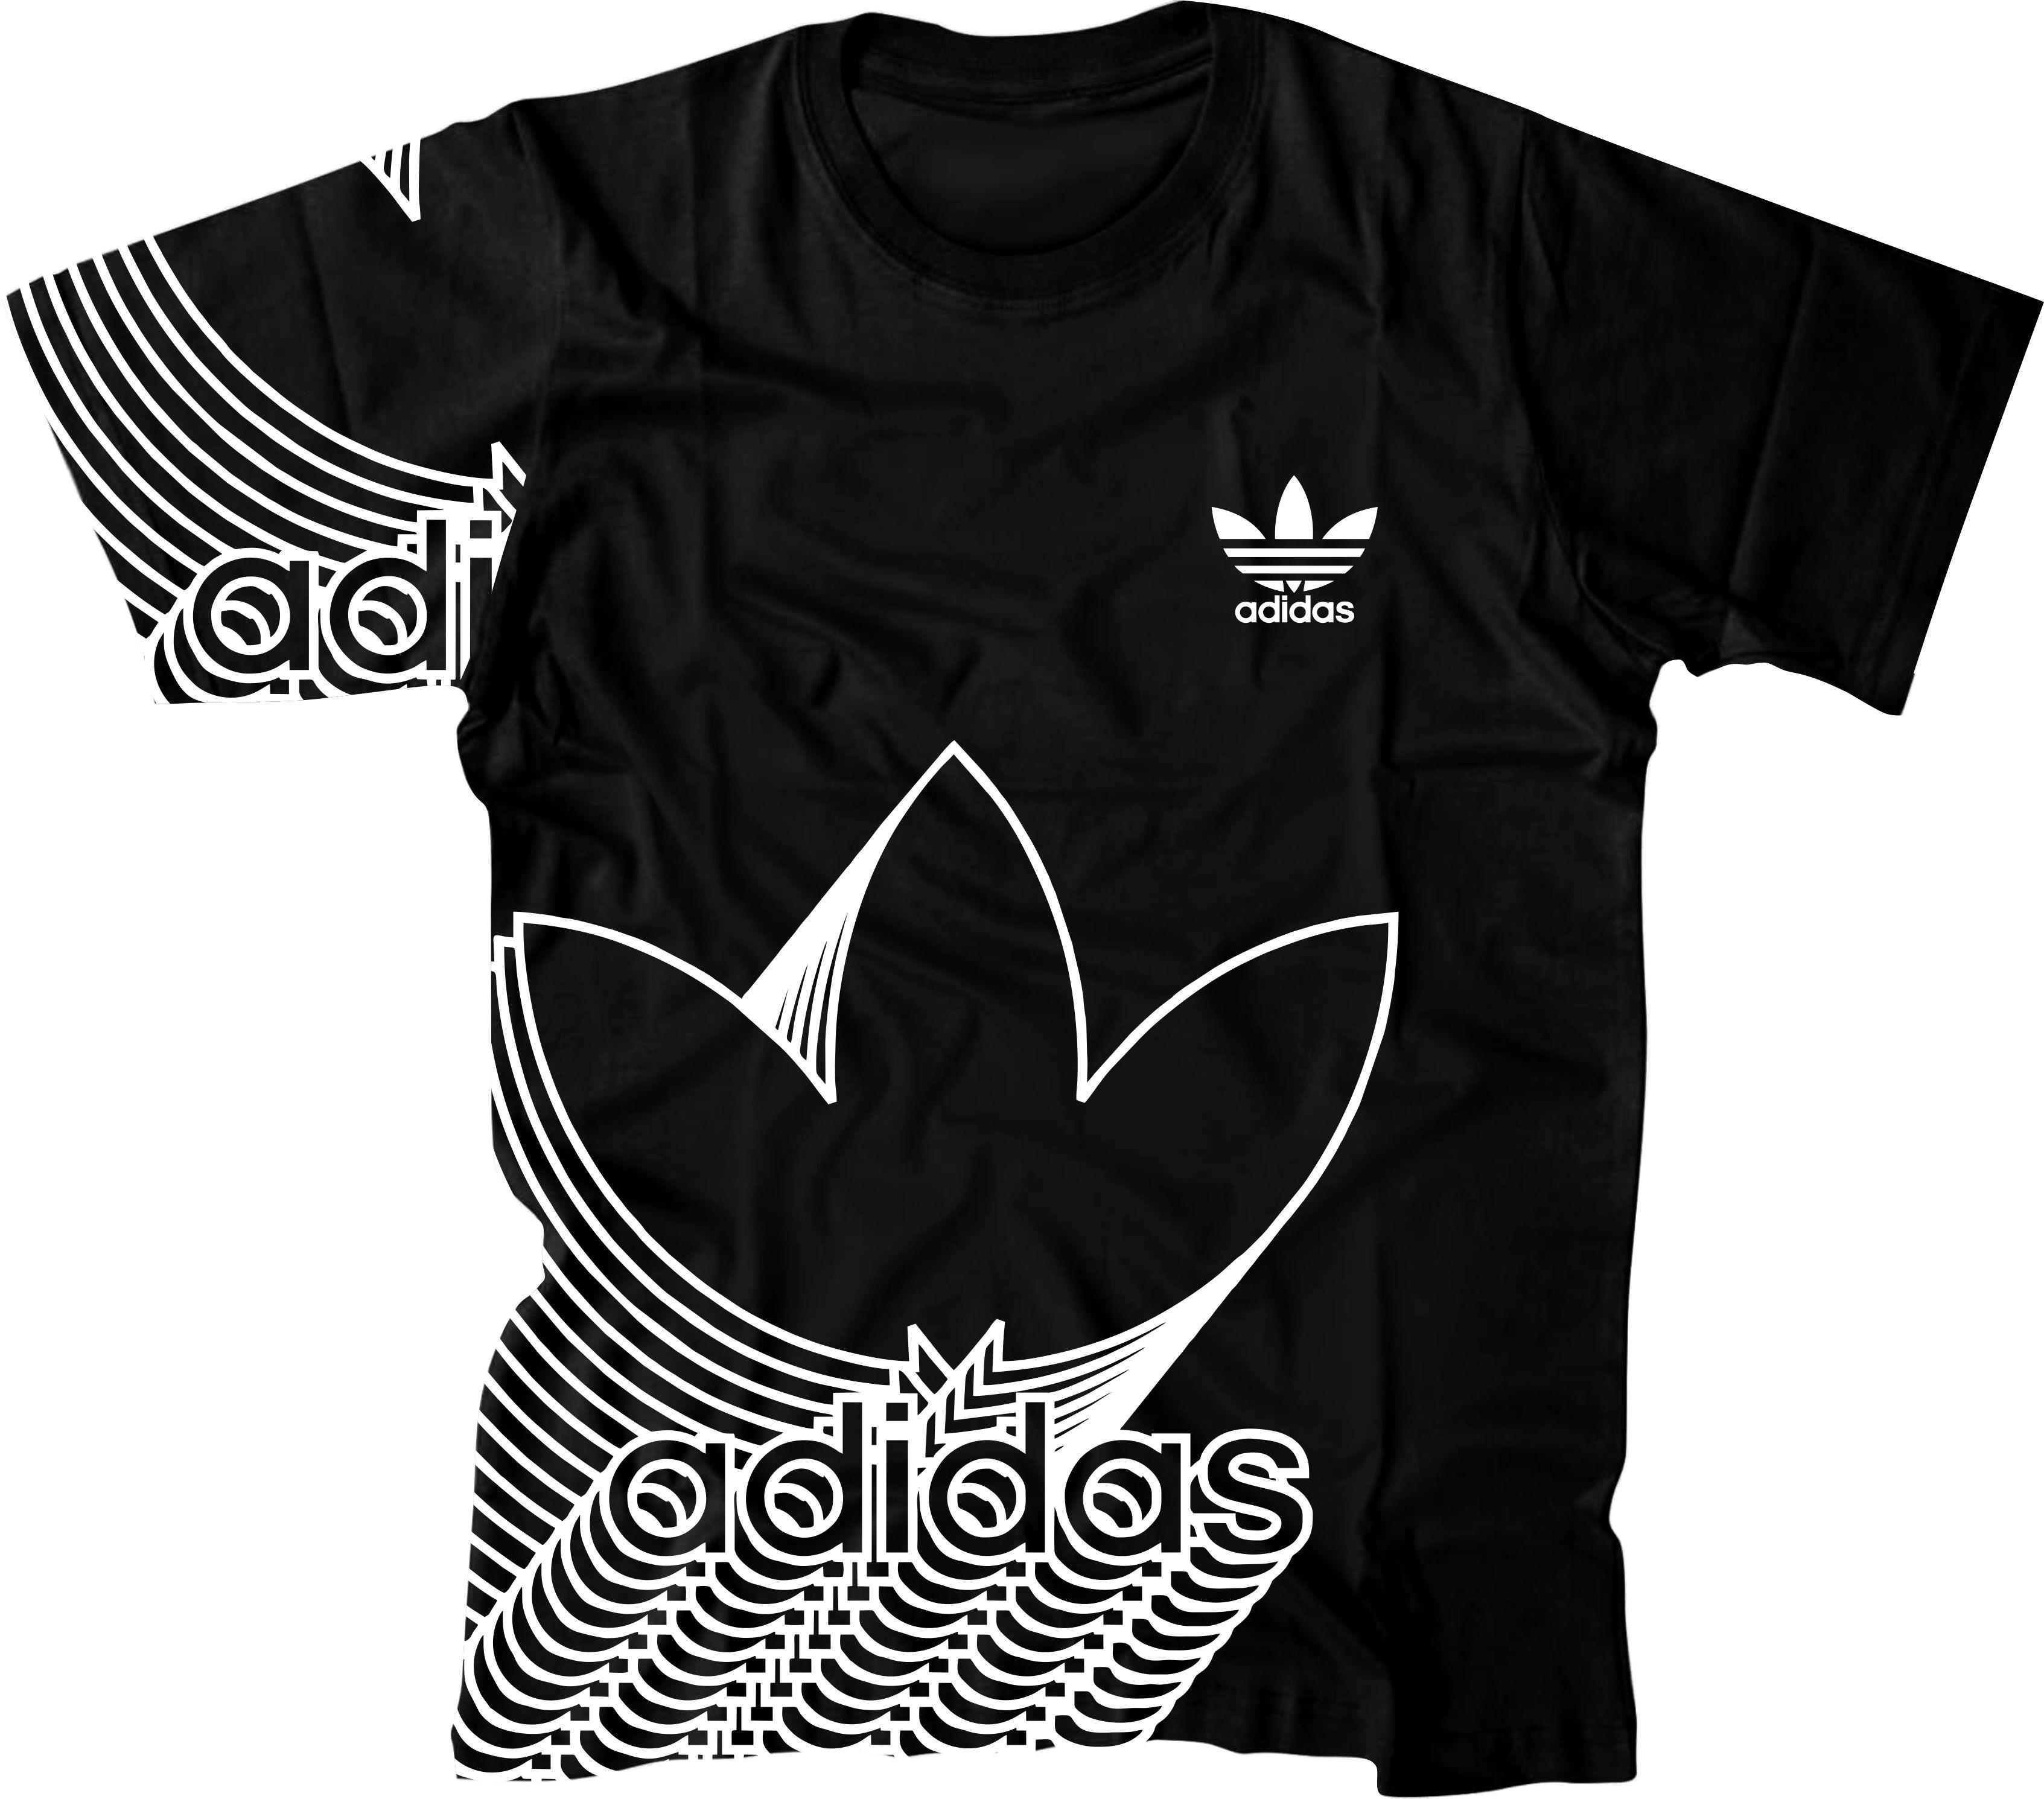 T Shirt Adidas 1